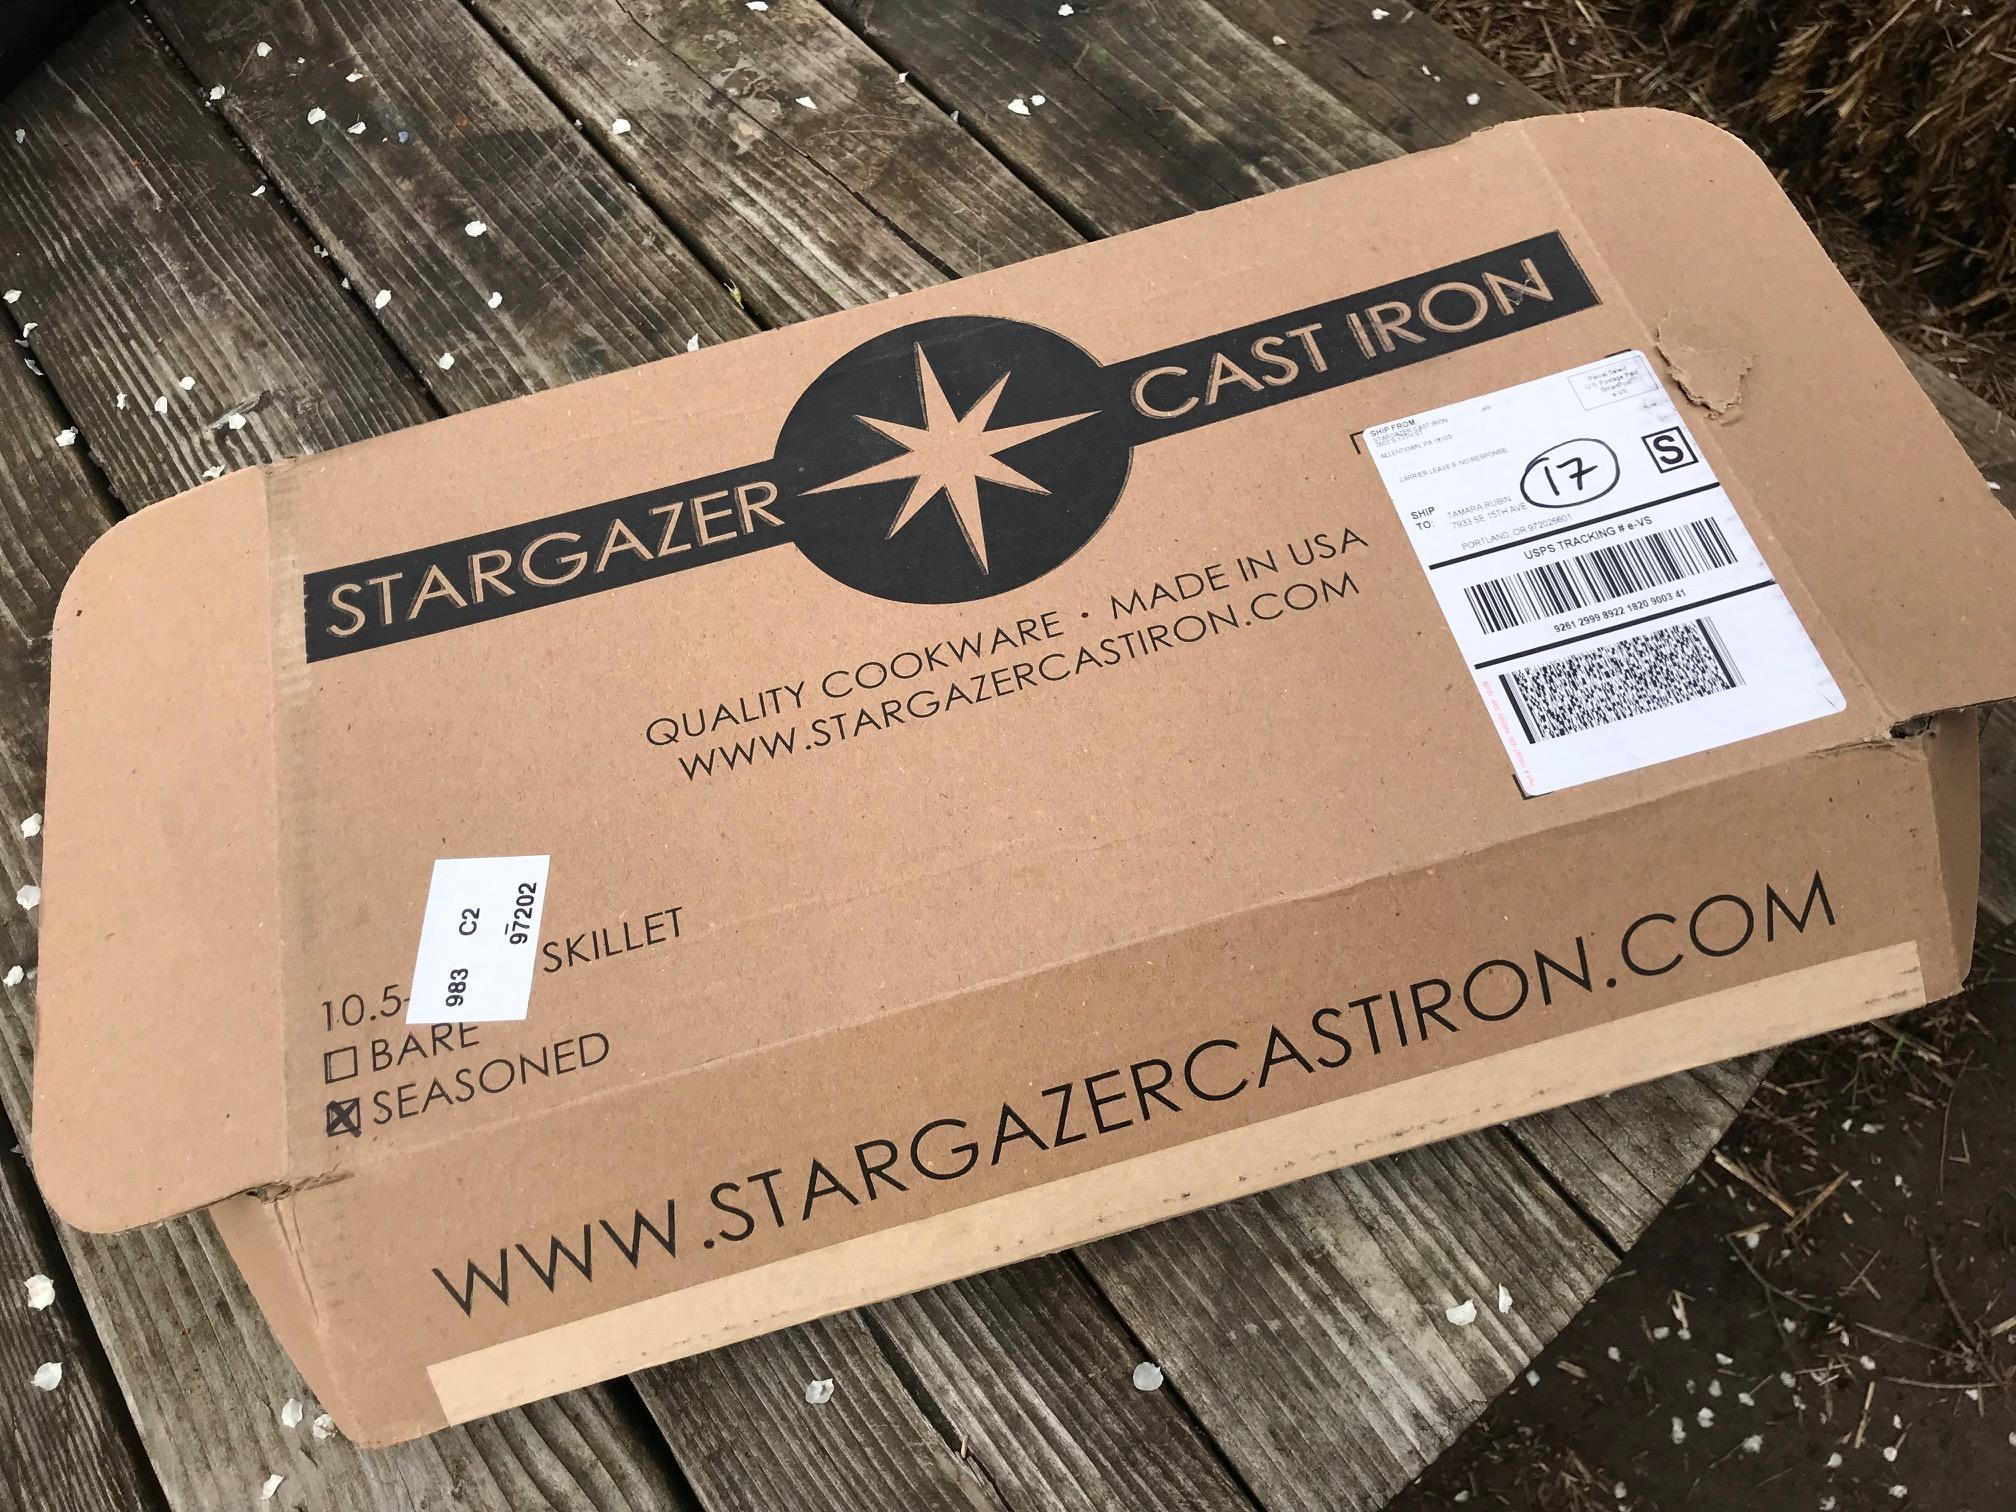 Stargazer Made In USA Pre-Seasoned Cast Iron: Lead Free [Cadmium Free, Mercury Free and Arsenic Free too!]